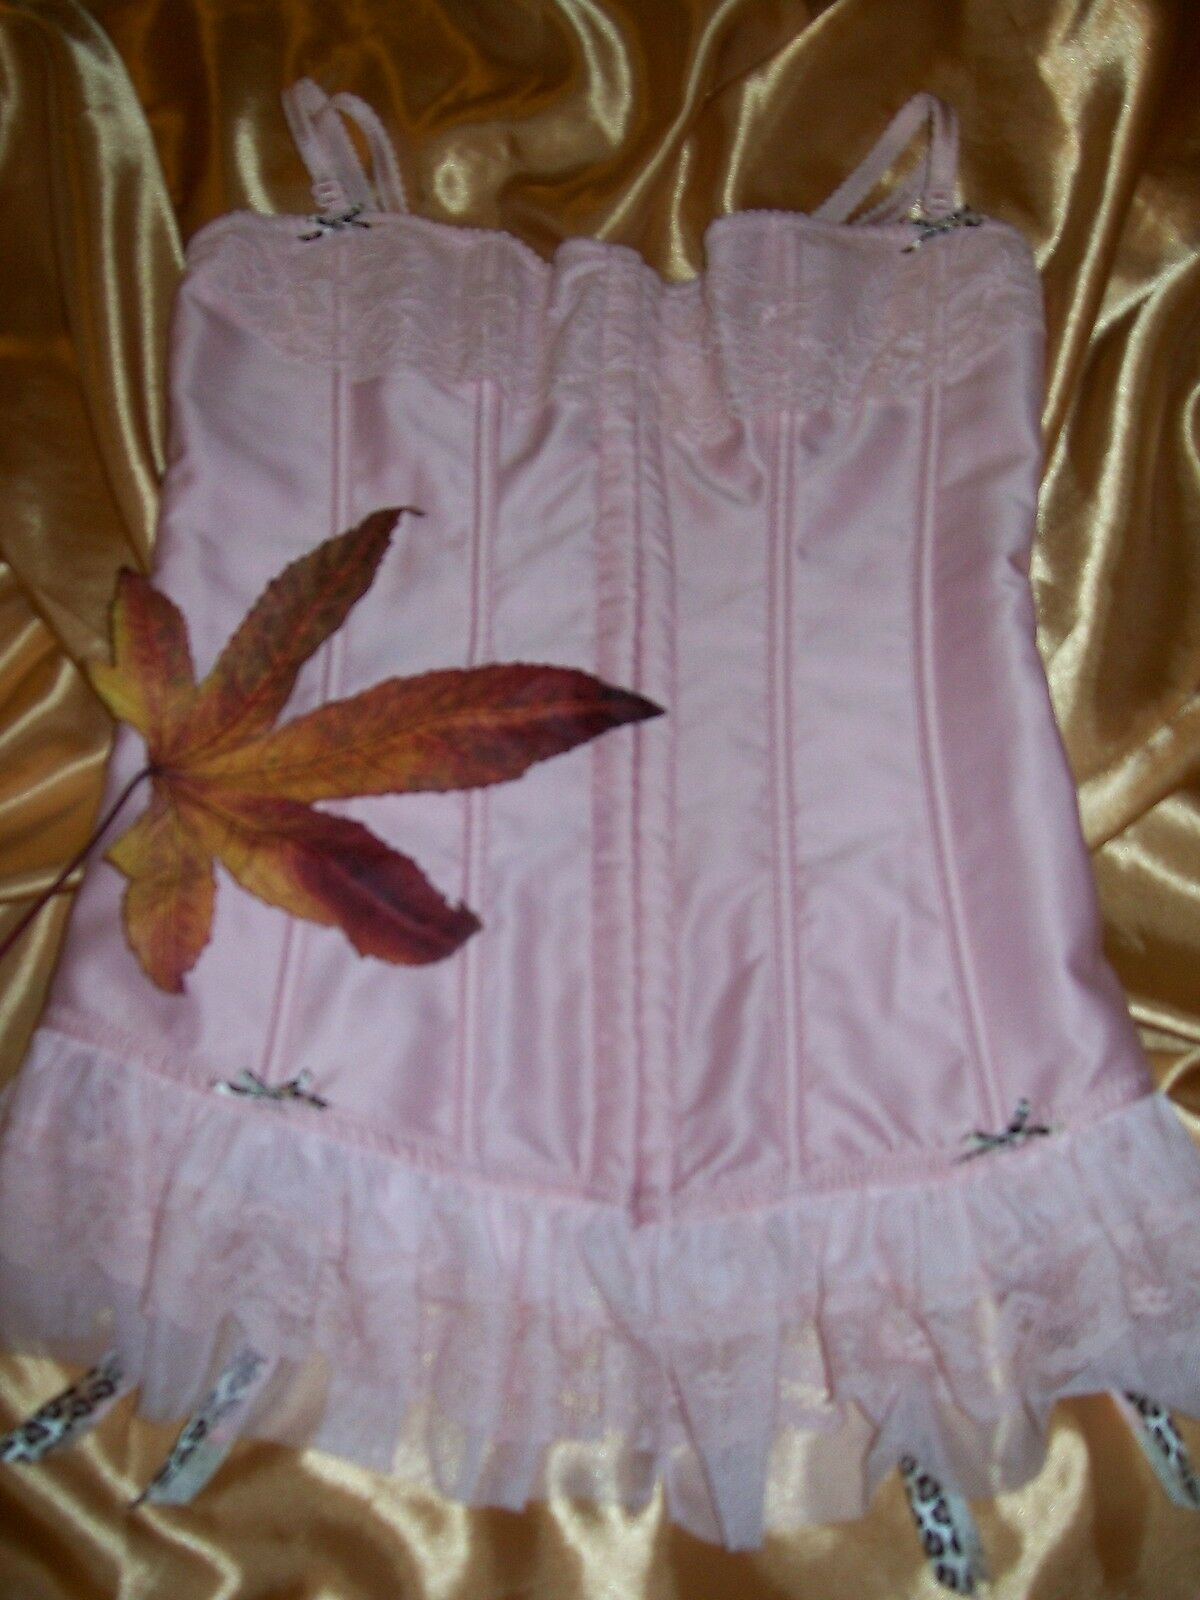 Ann Summers Victoriana pink boned satin & lace suspender corset basque 8 BNWT